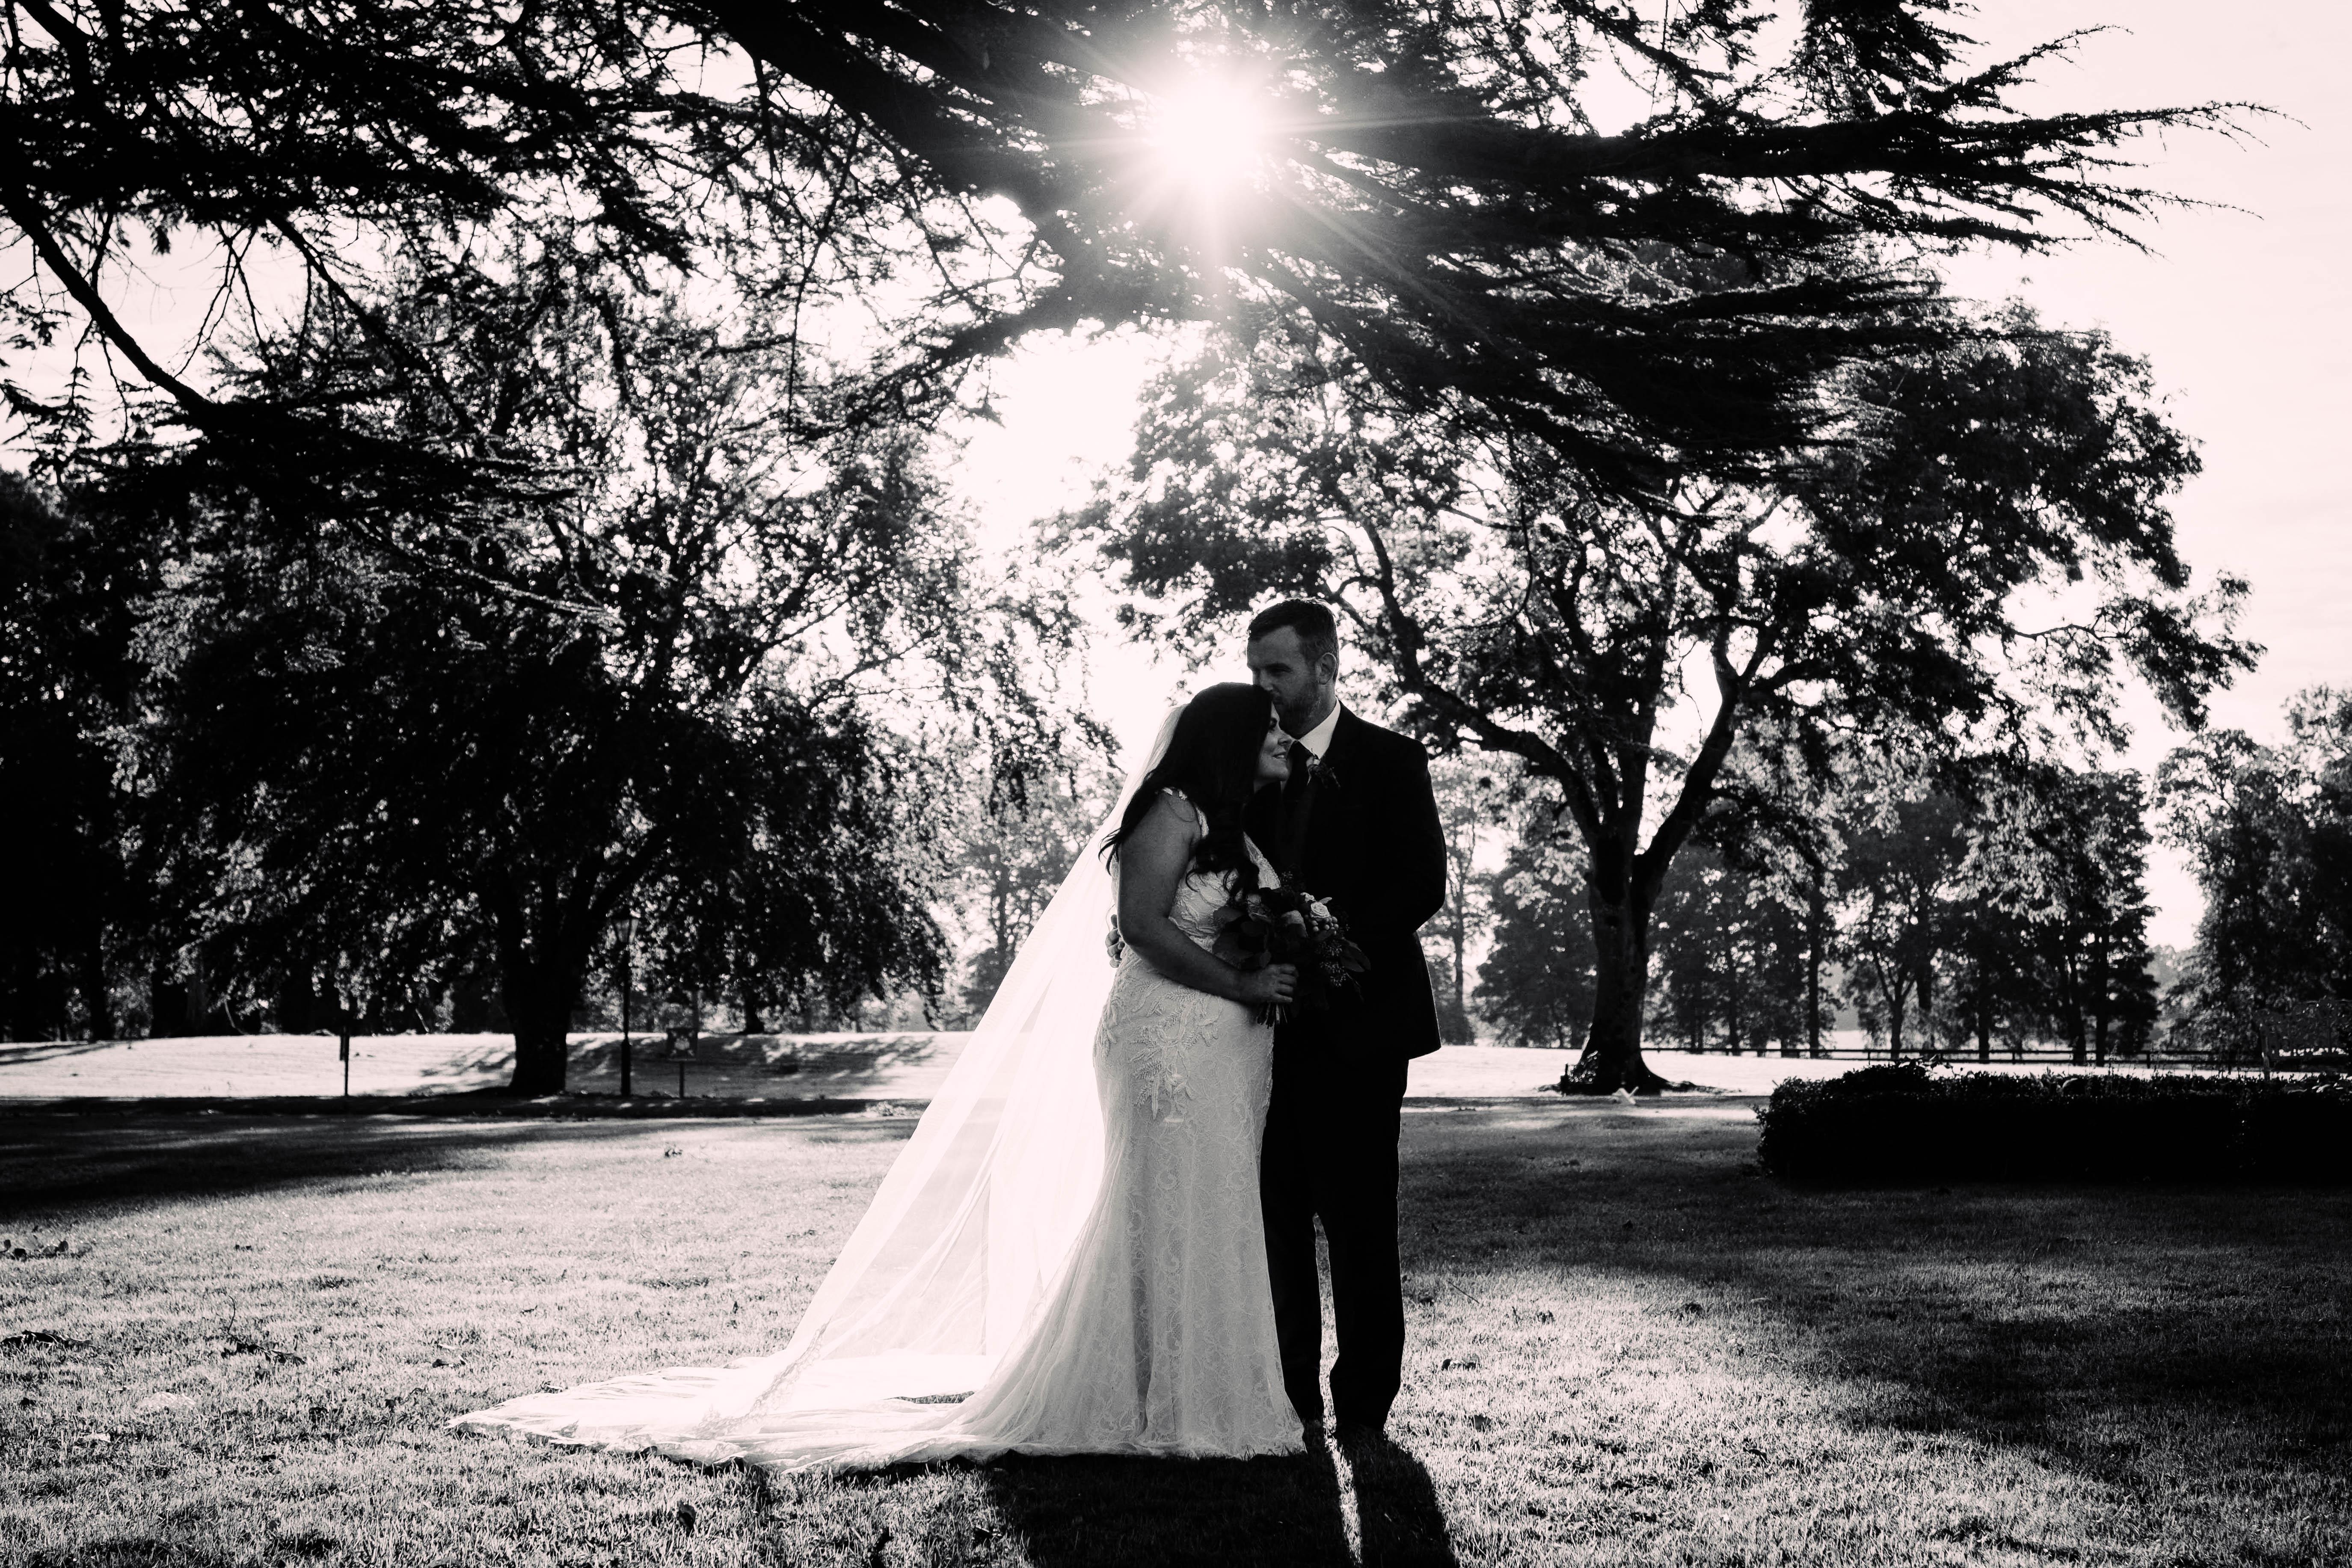 wedding photographer Dublin, dublin wedding photographer, Tankardstown Weddings, wedding photographer, top wedding photographer